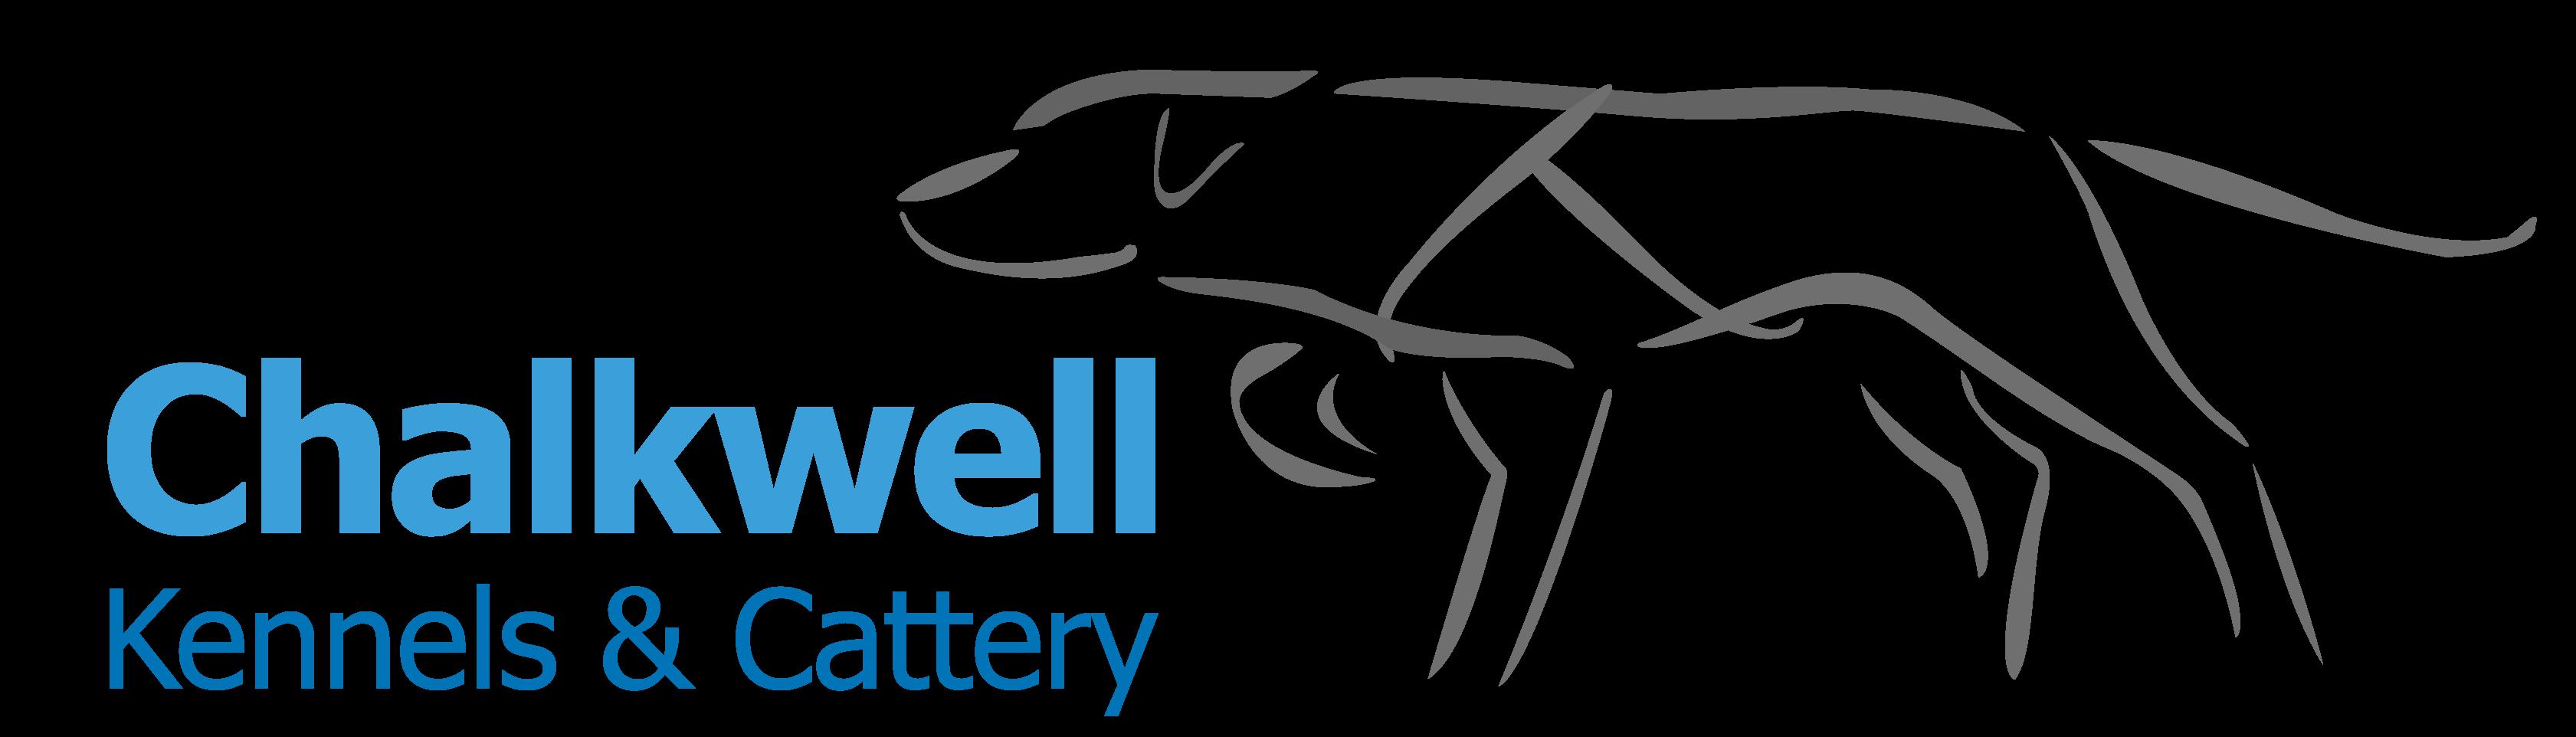 Chalkwell Kennels